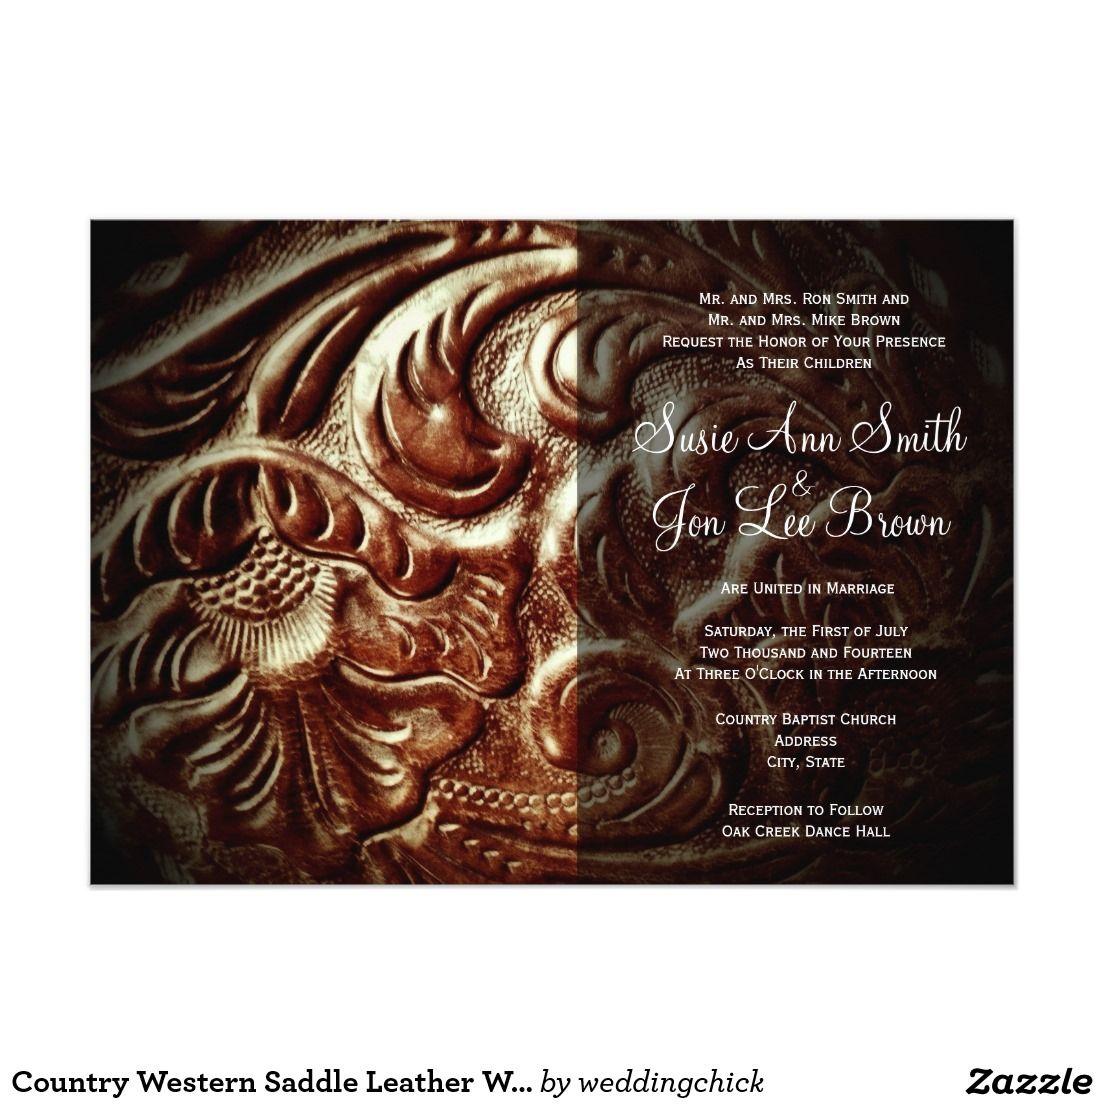 Country Western Saddle Leather Design Wedding Invitations